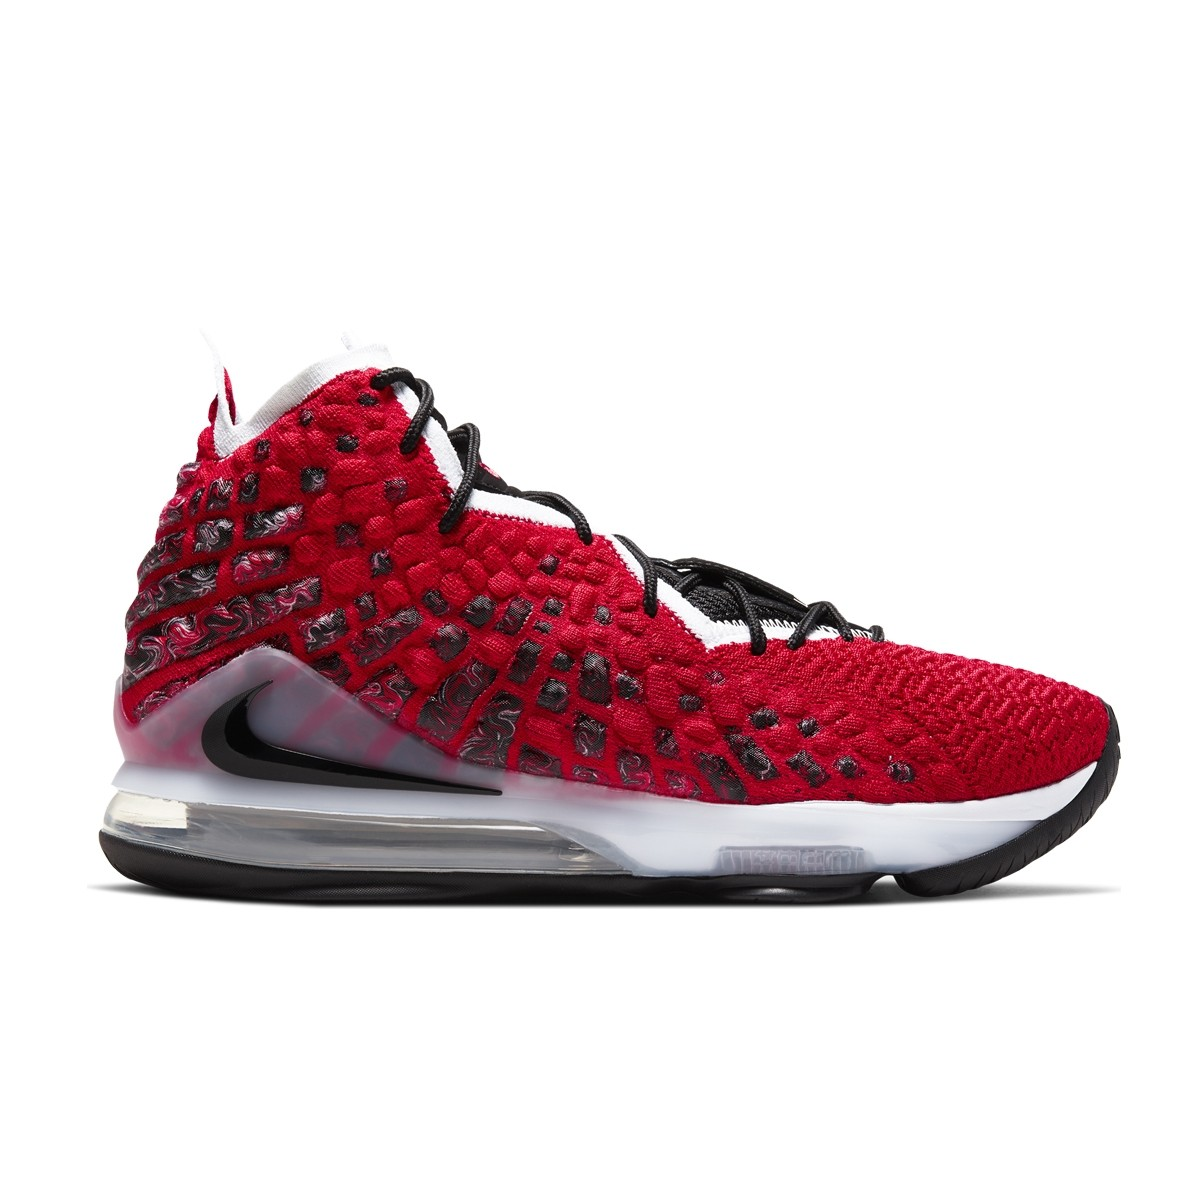 Nike Lebron XVII 'Uptempo'